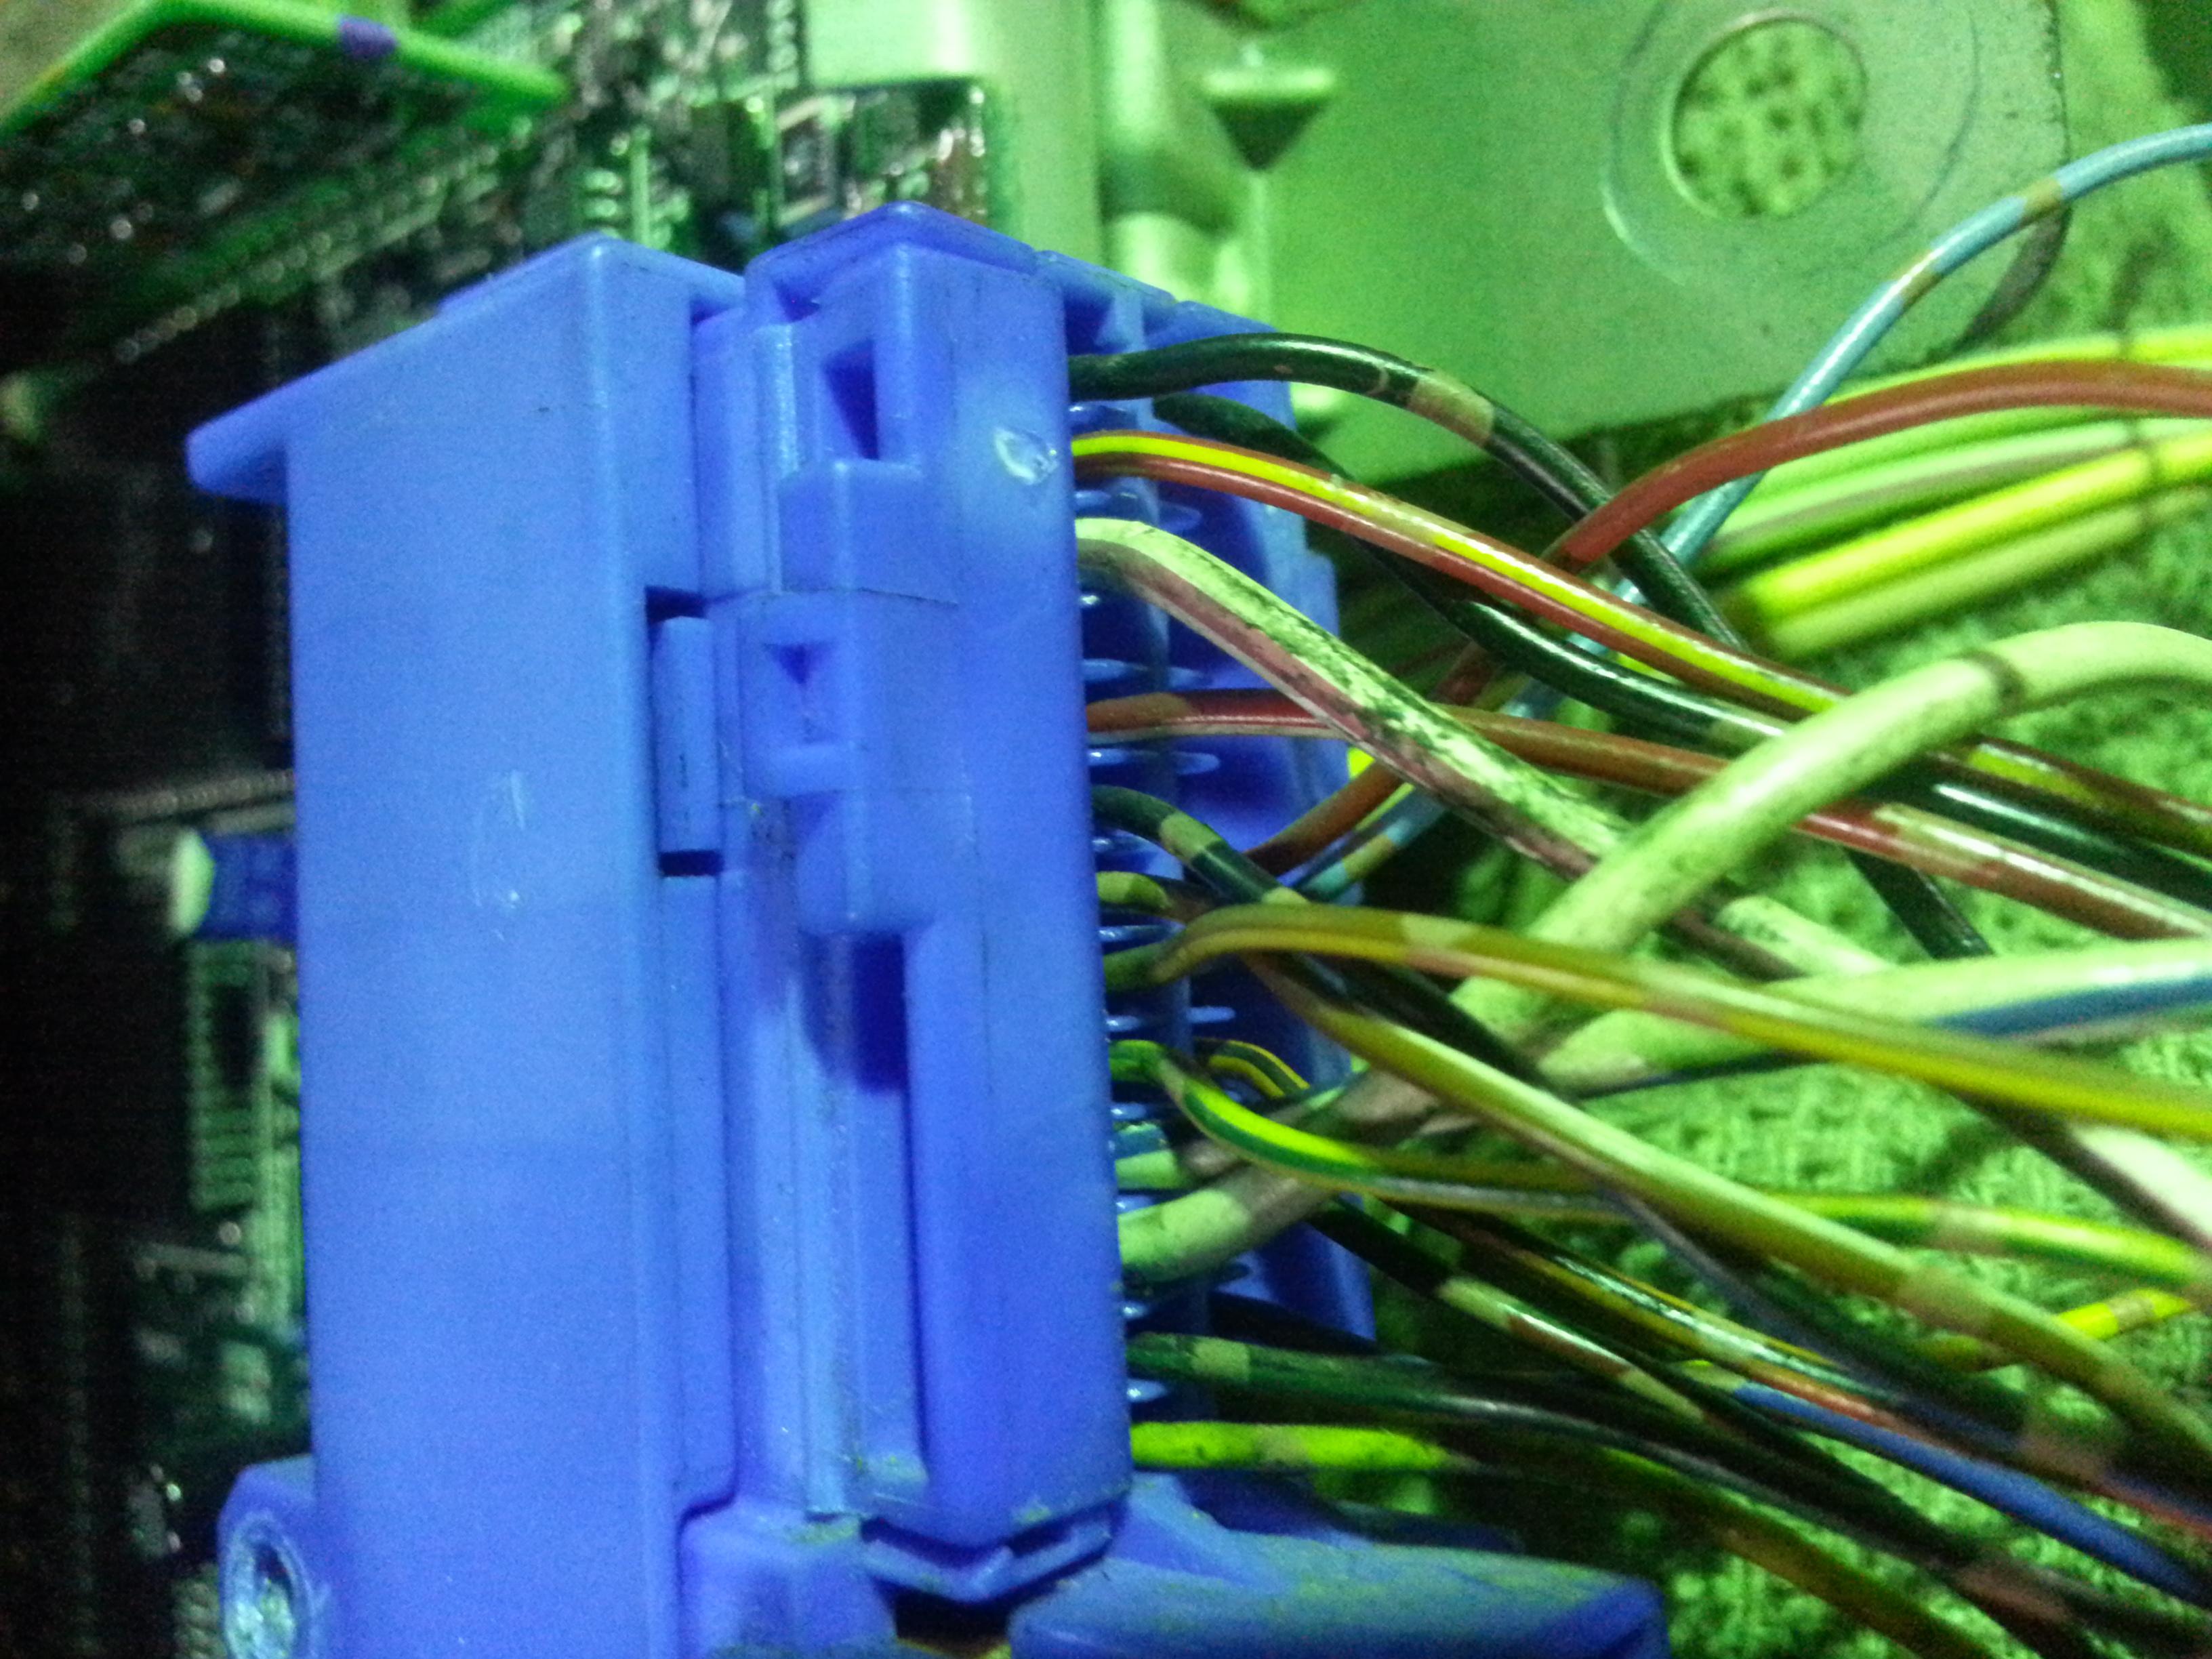 Vh45de Wiring Diagram - Wiring Diagram Gp on 240sx s13, sr20 s13, 1uz s13, custom s13,